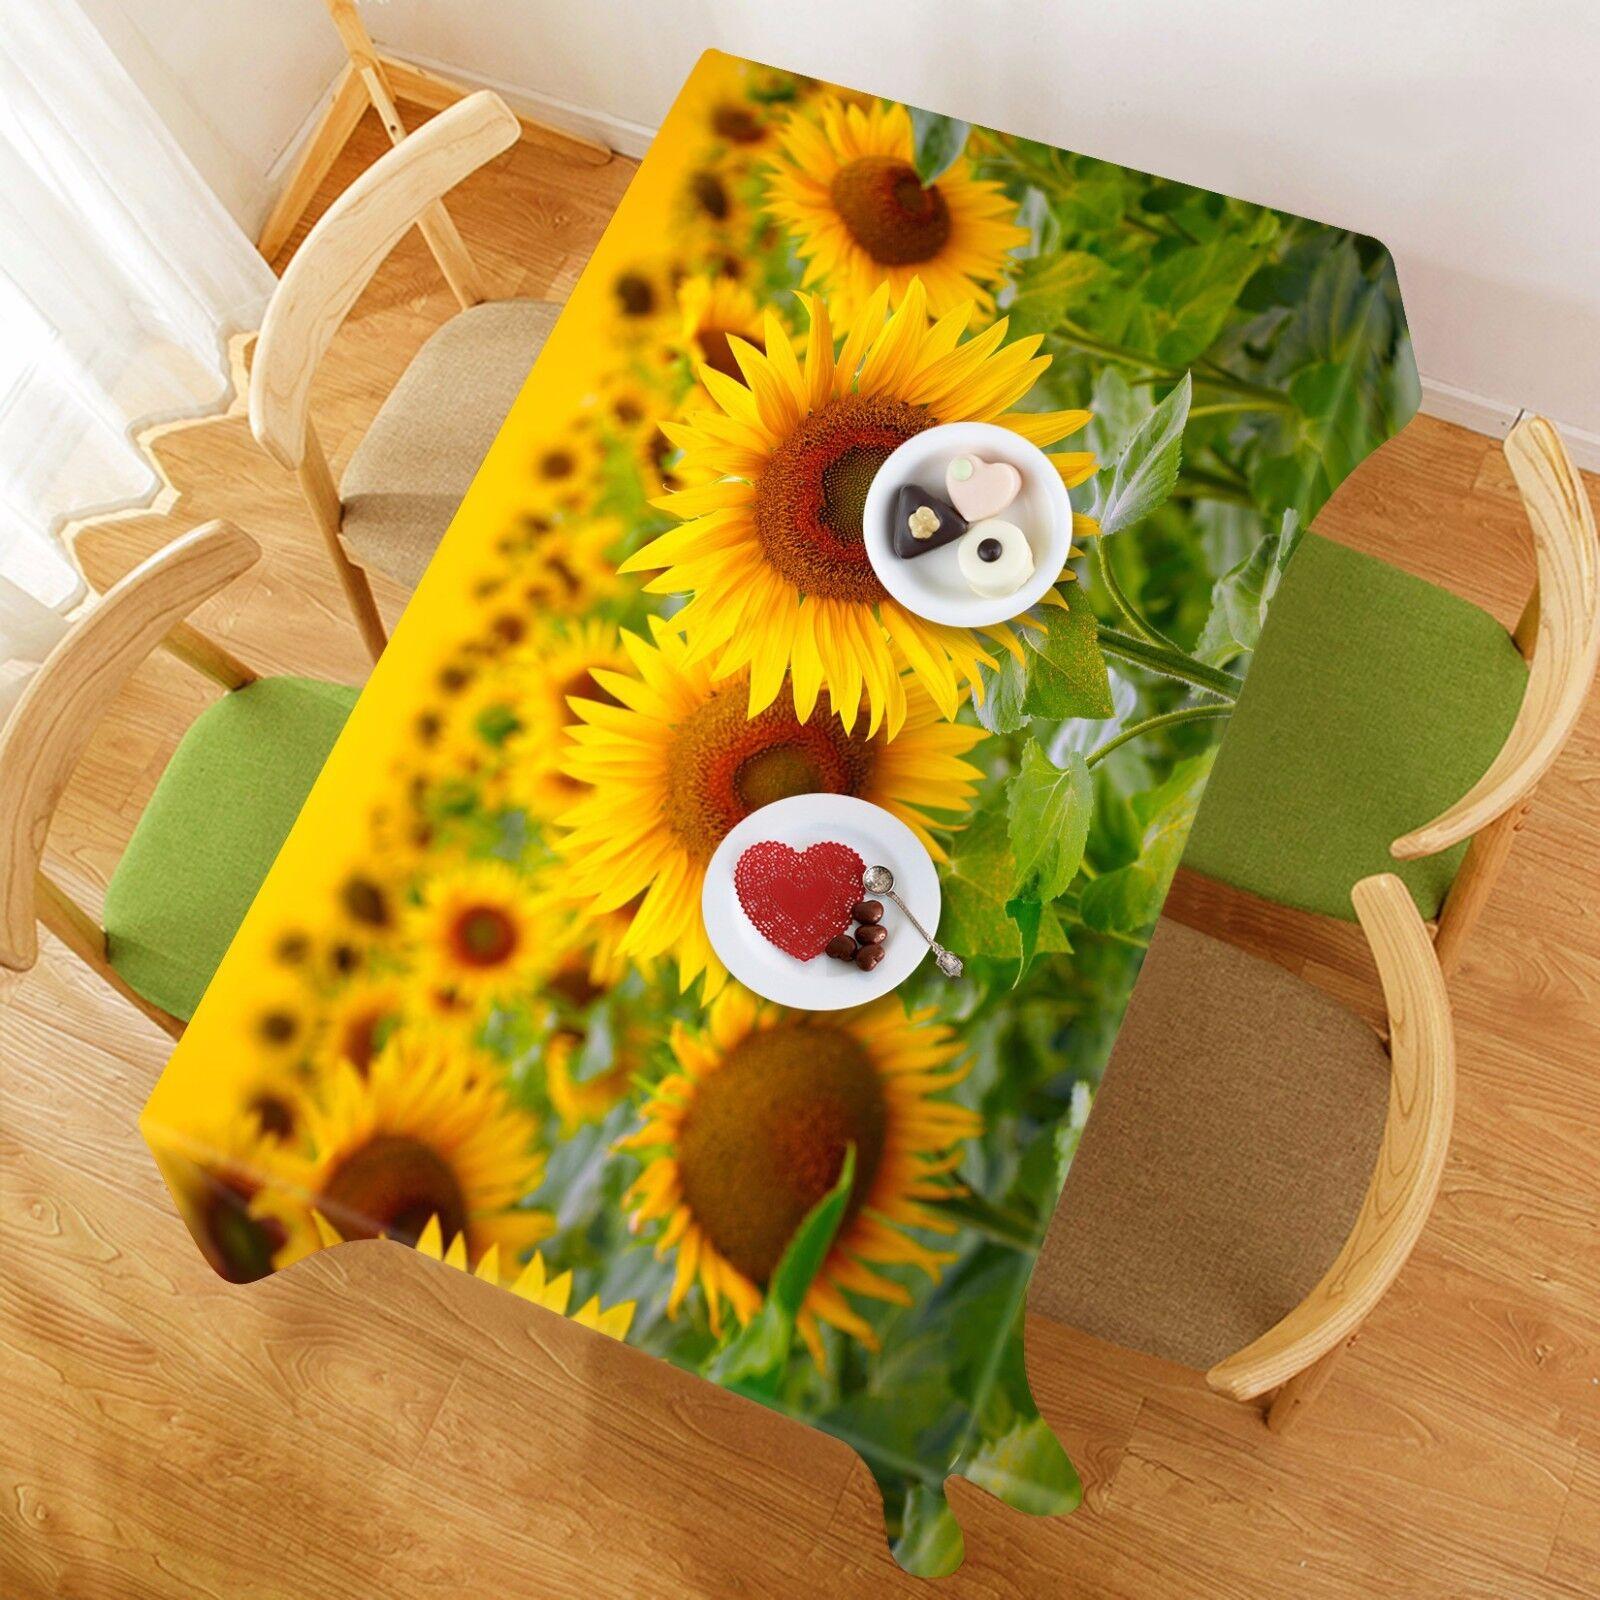 3D Sunflower Tablecloth Table Cover Cloth Birthday Party AJ WALLPAPER UK Lemon